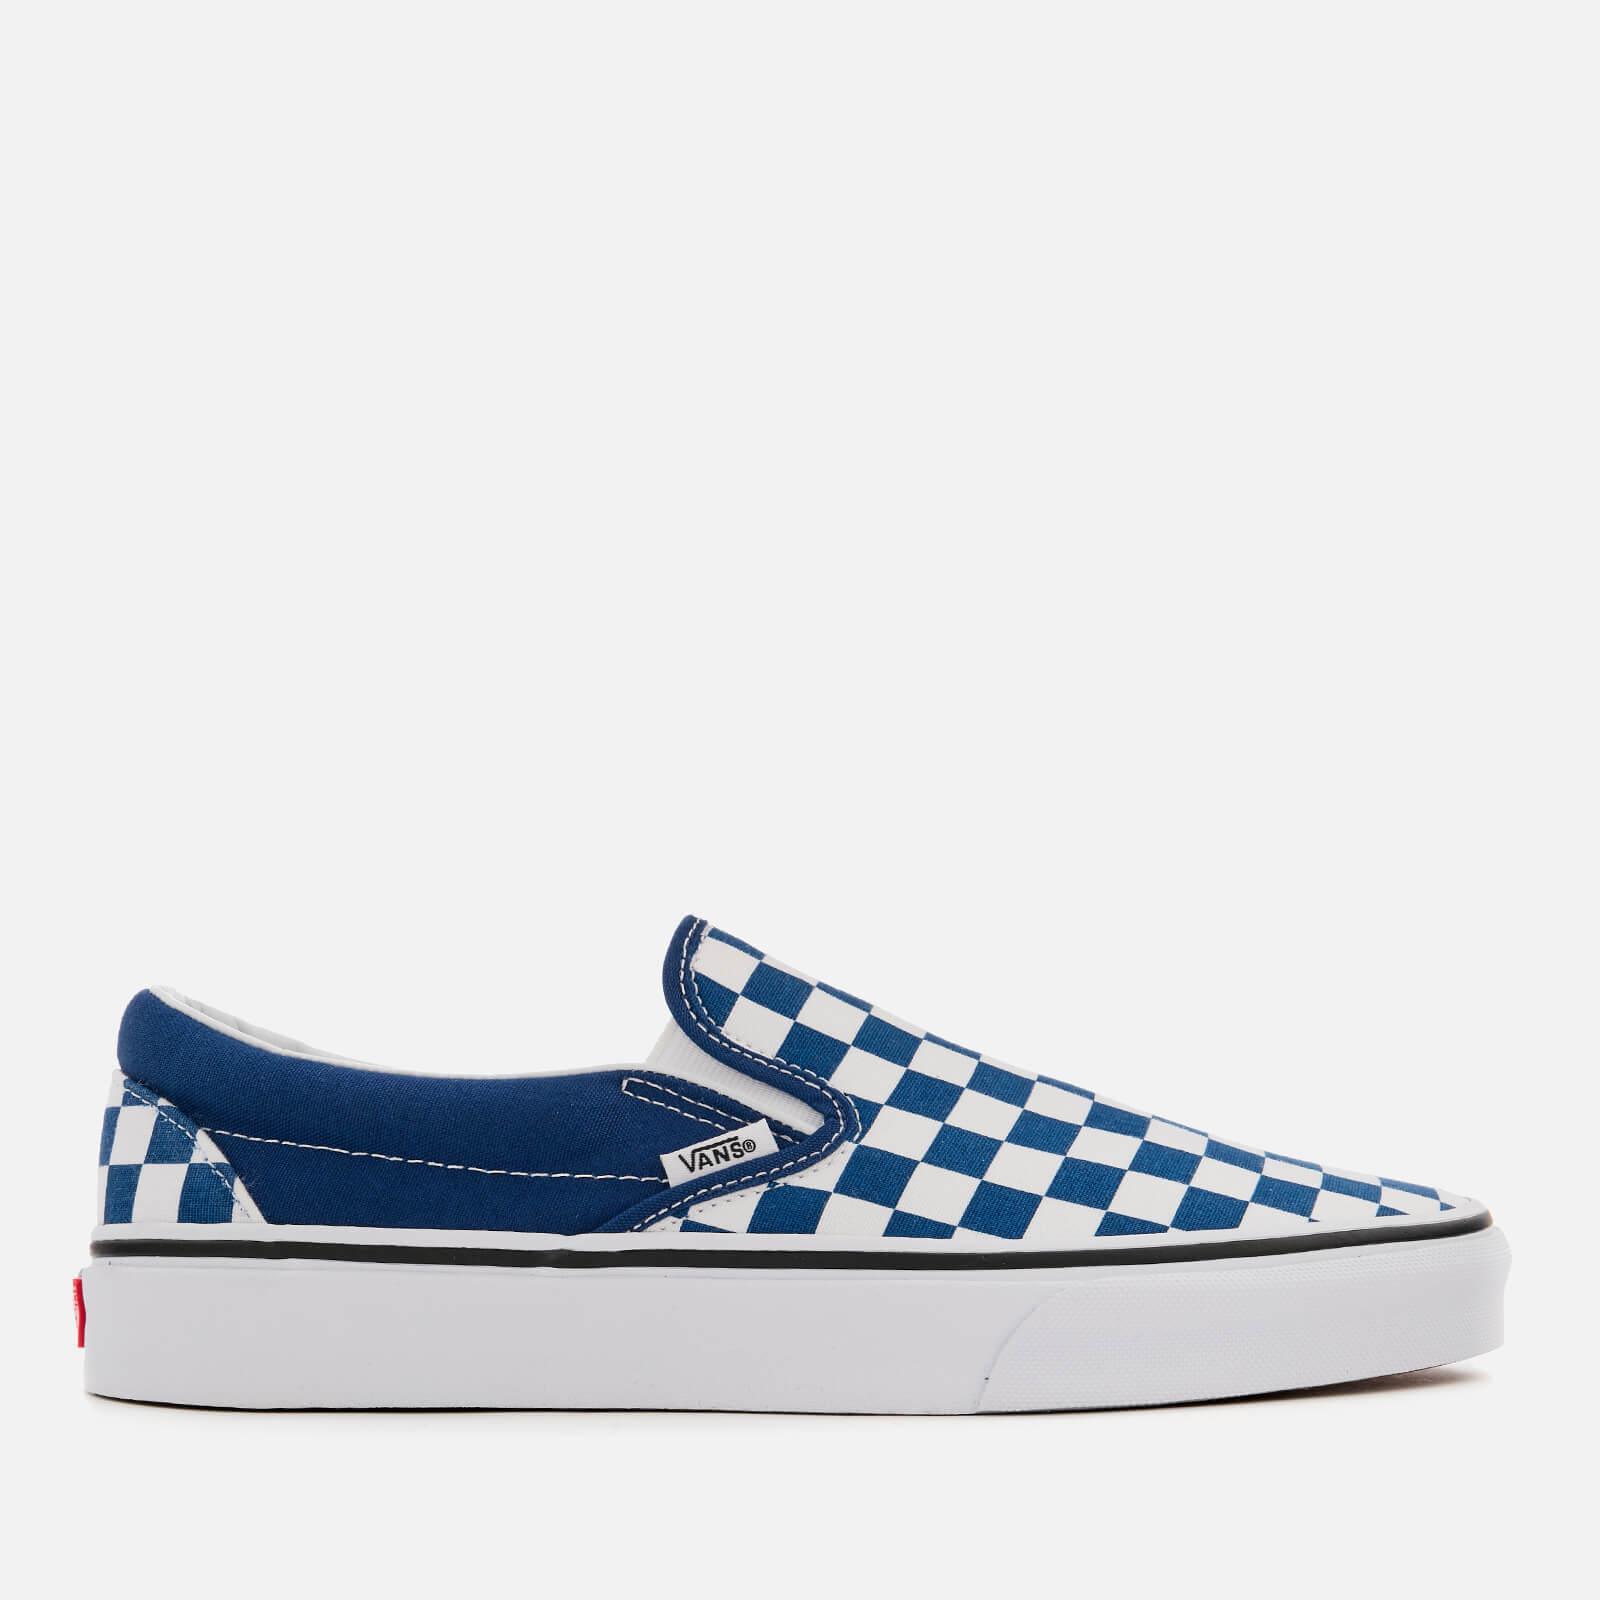 vans checkerboard slip on trainers